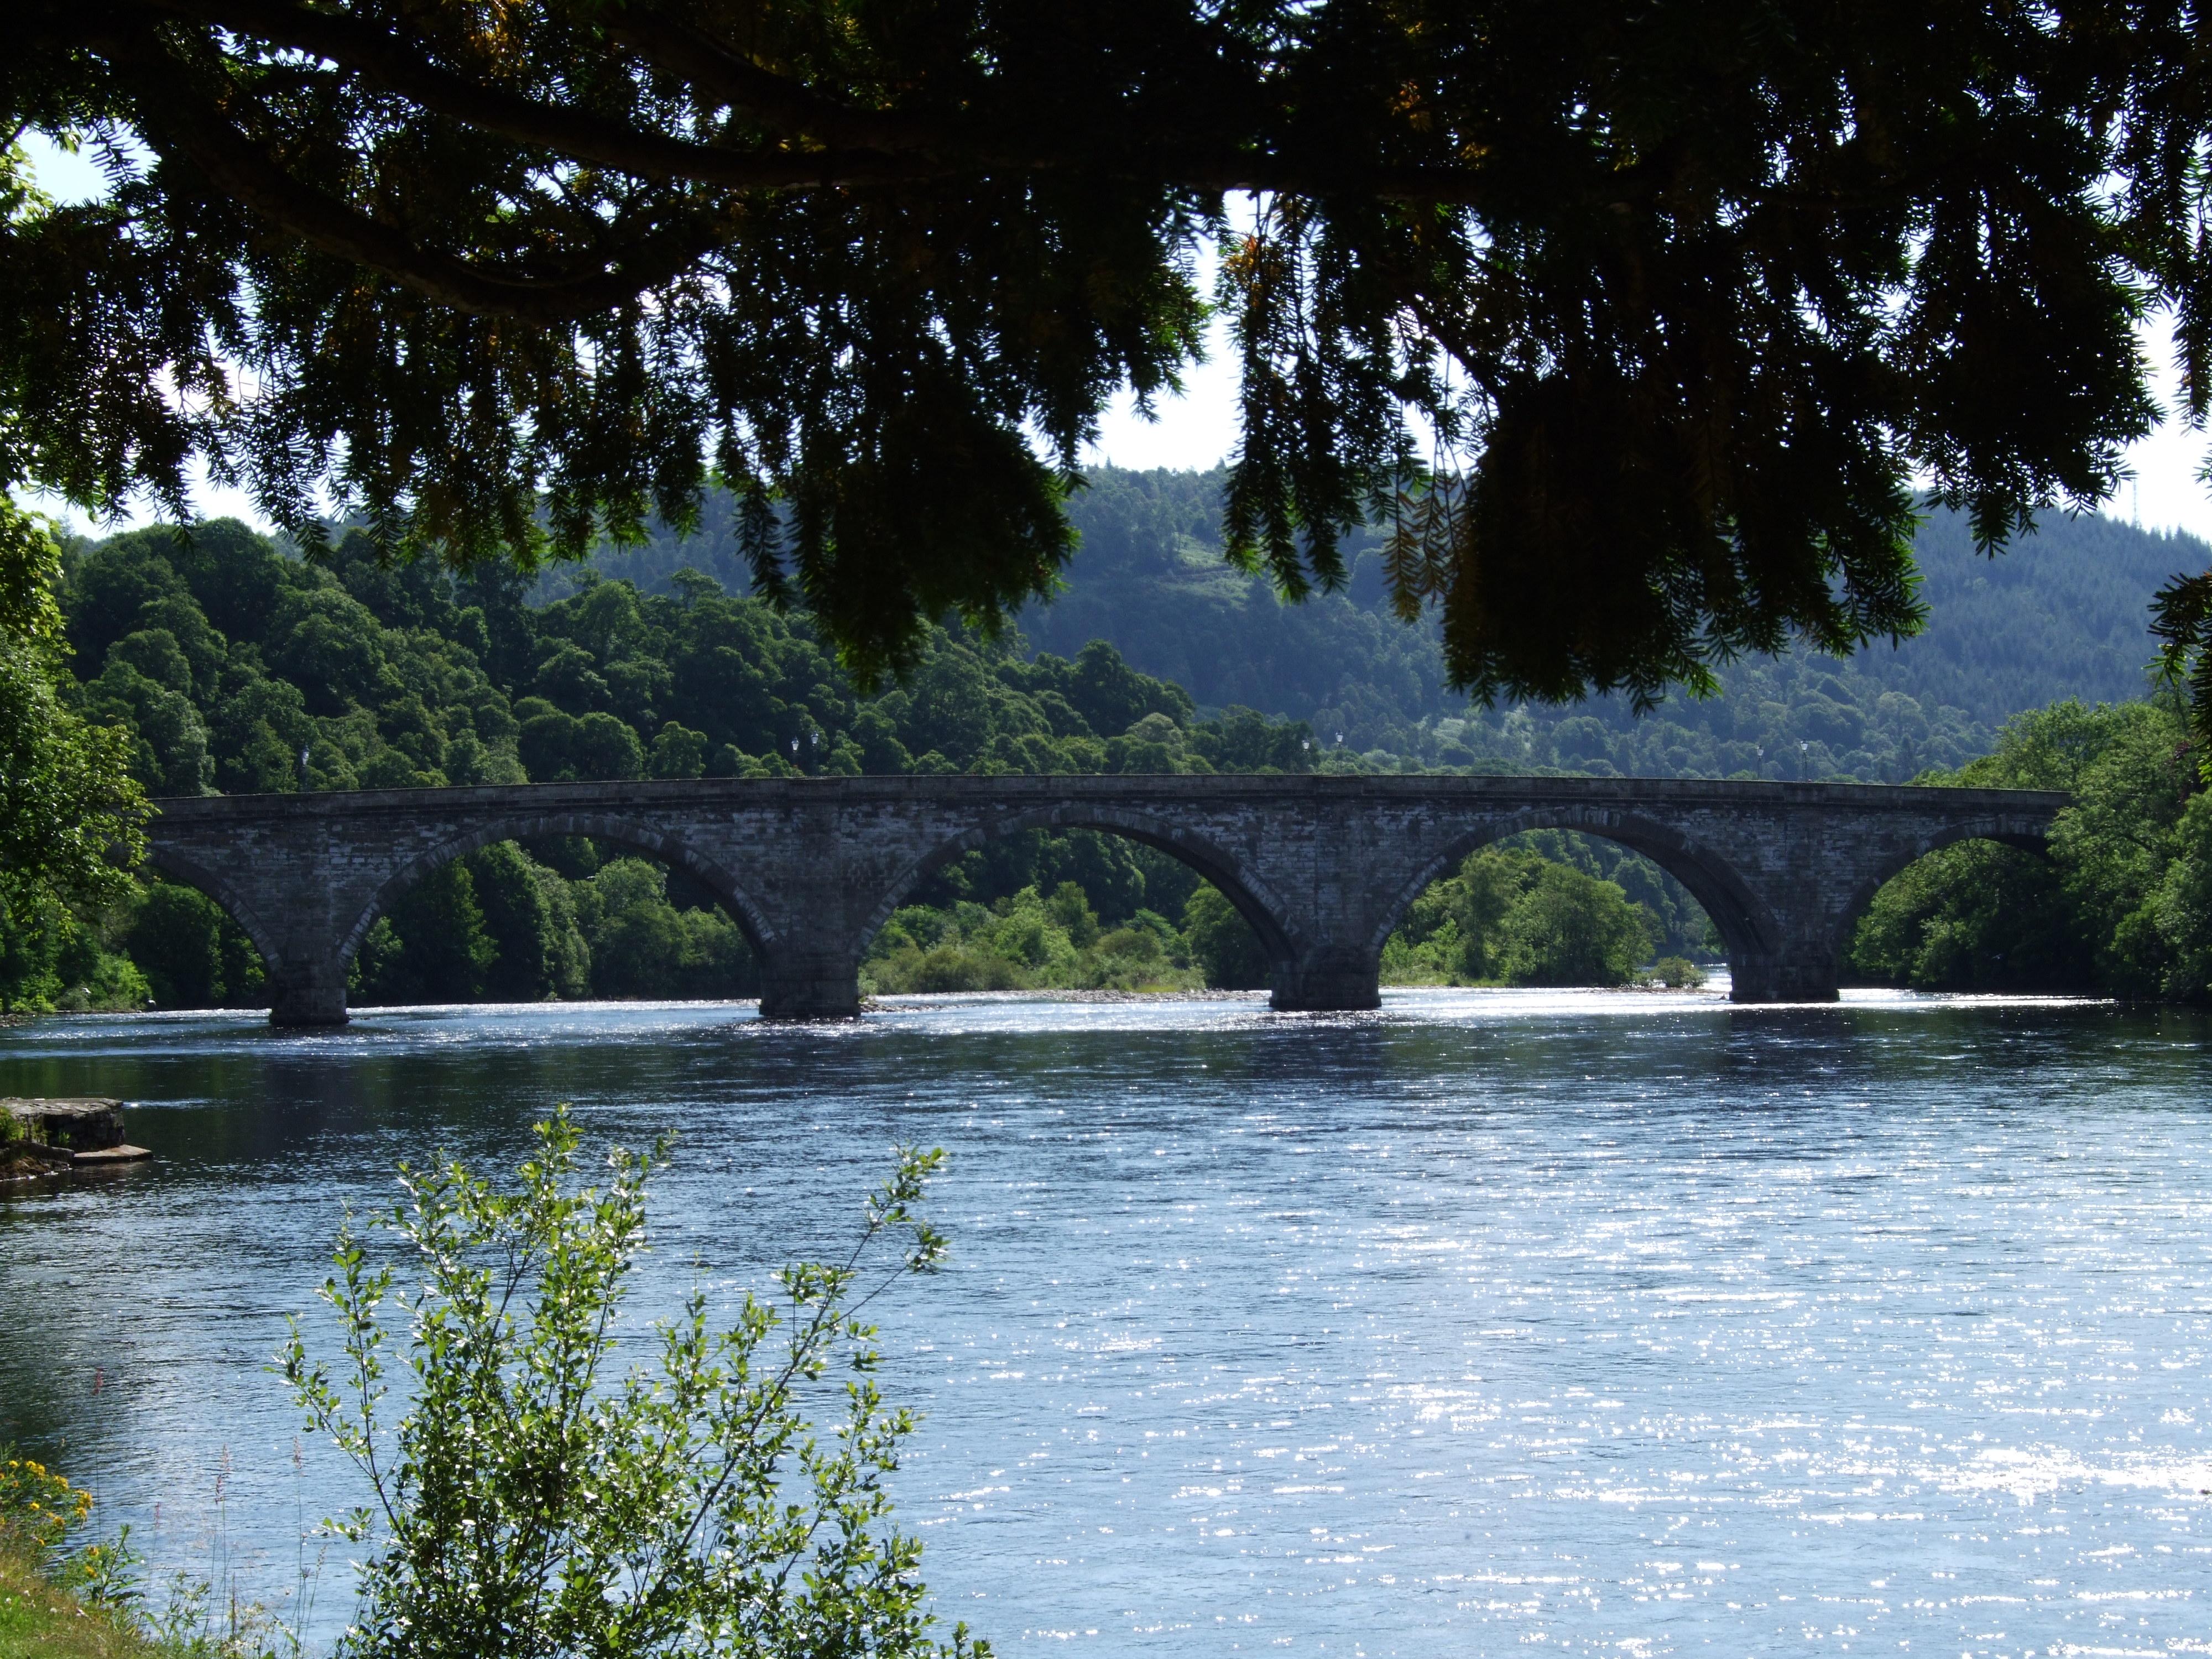 1.Dunkeld - Bridge